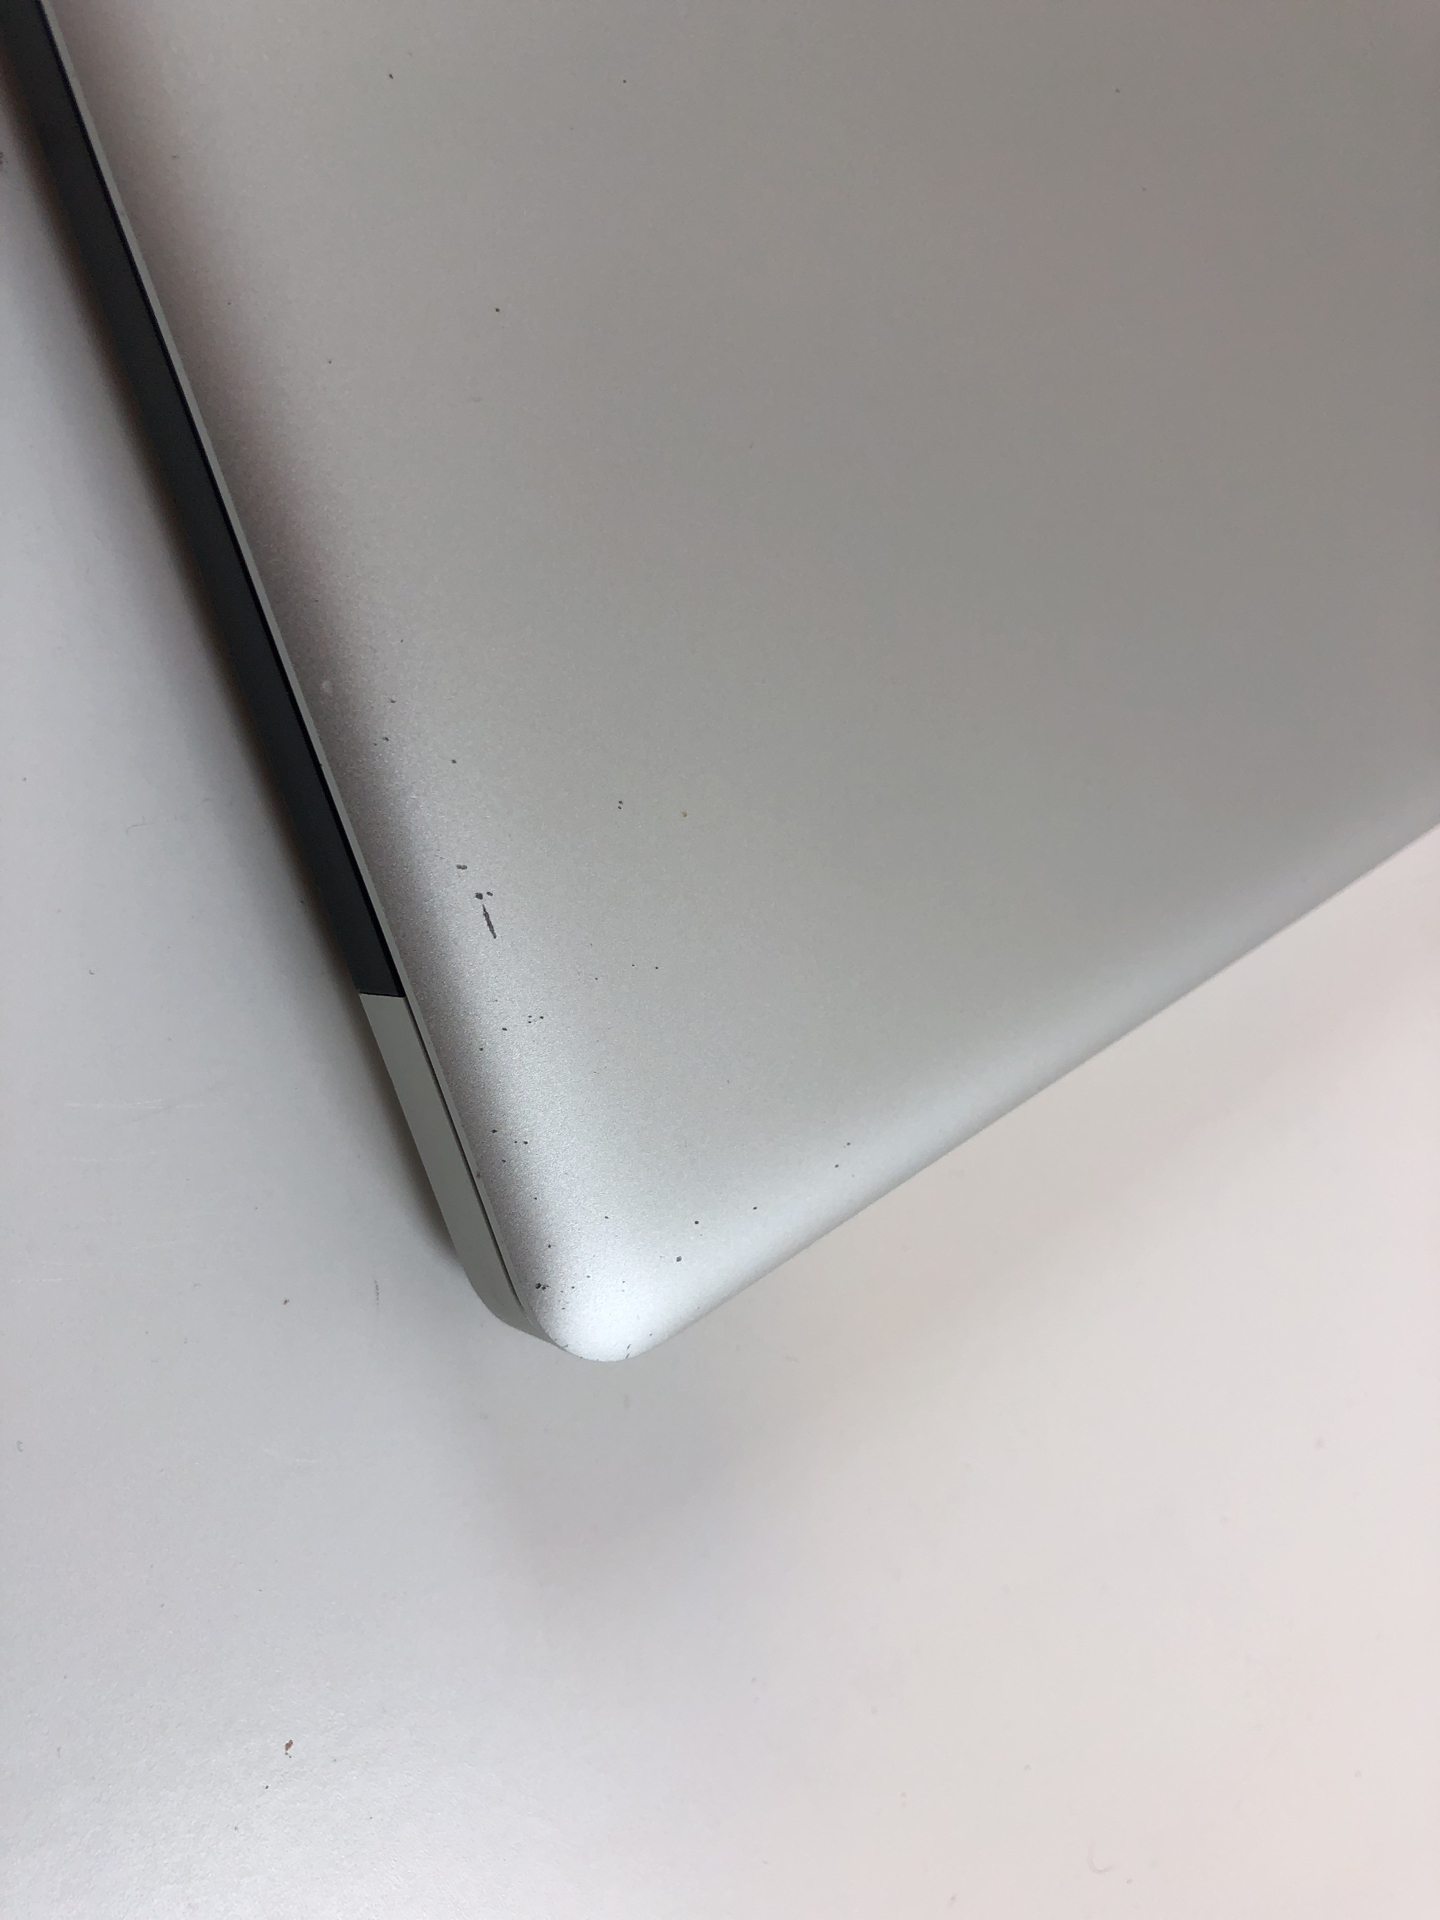 "MacBook Pro 15"" Mid 2012 (Intel Quad-Core i7 2.3 GHz 8 GB RAM 256 GB SSD), Intel Quad-Core i7 2.3 GHz, 8 GB RAM, 256 GB SSD, Kuva 4"